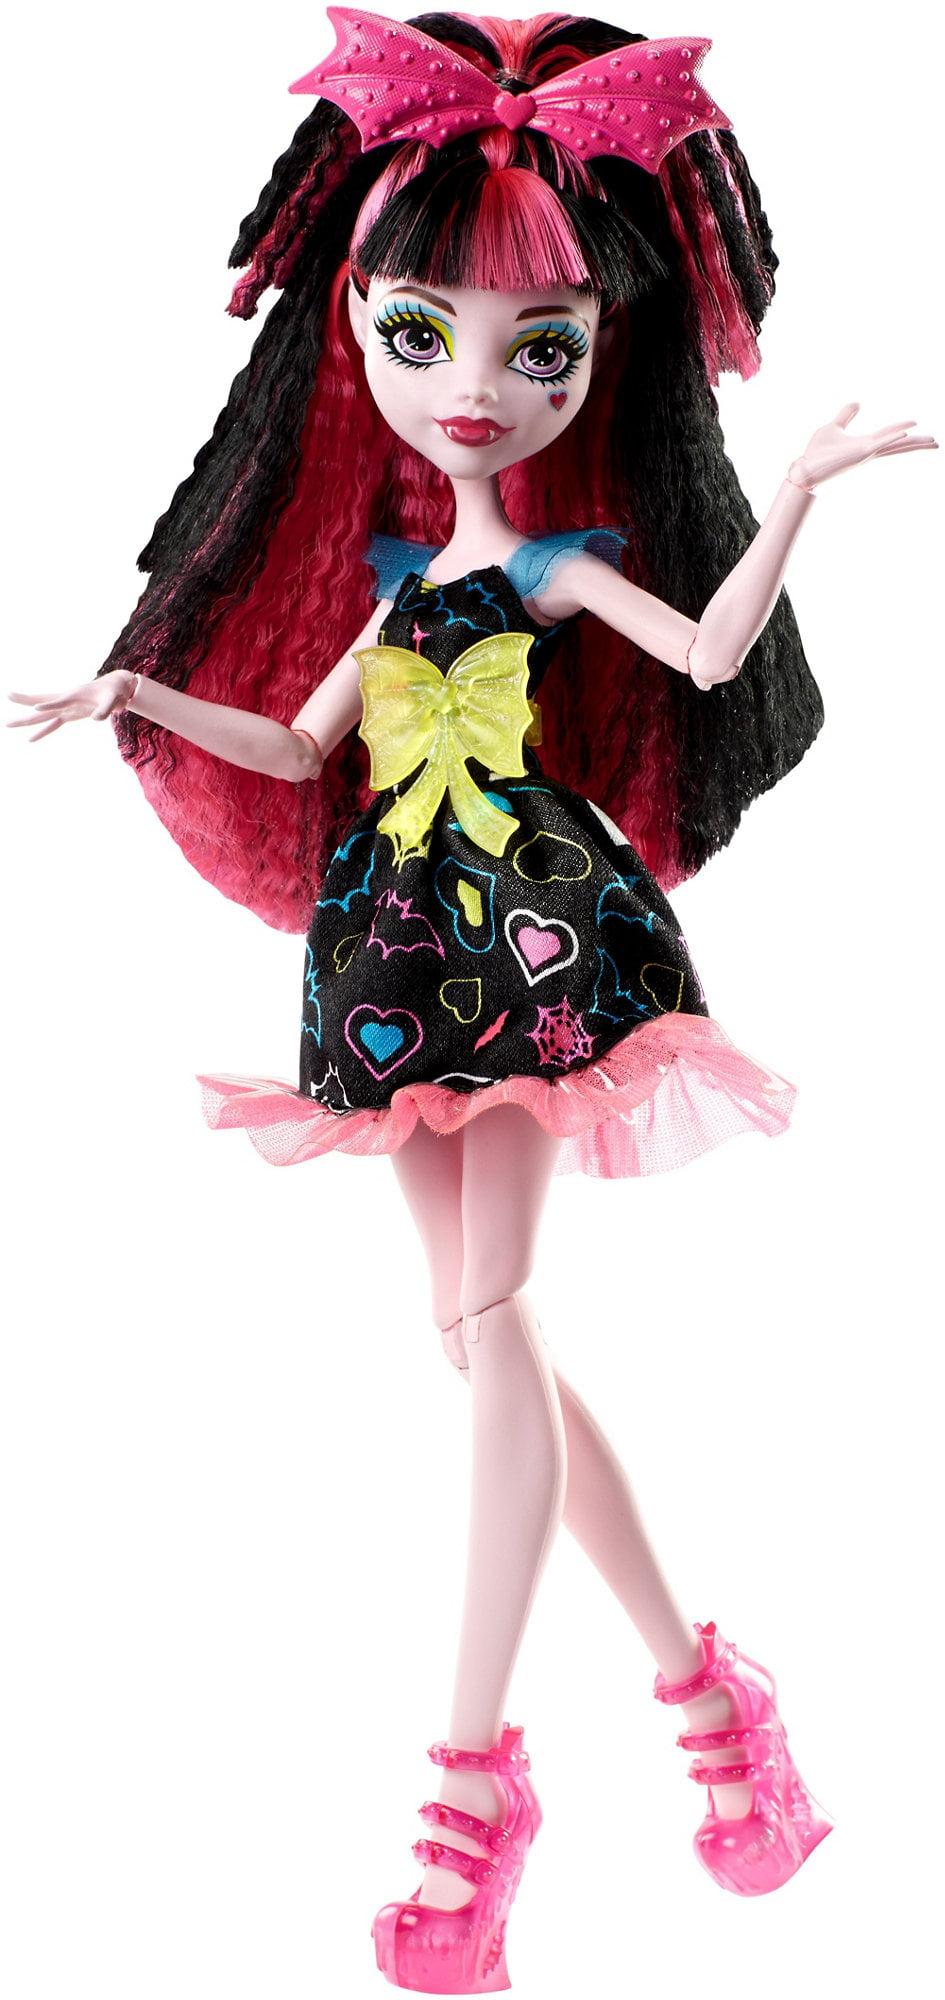 Monster High Electrified Hair-Raising Ghouls Draculaura Doll by Mattel